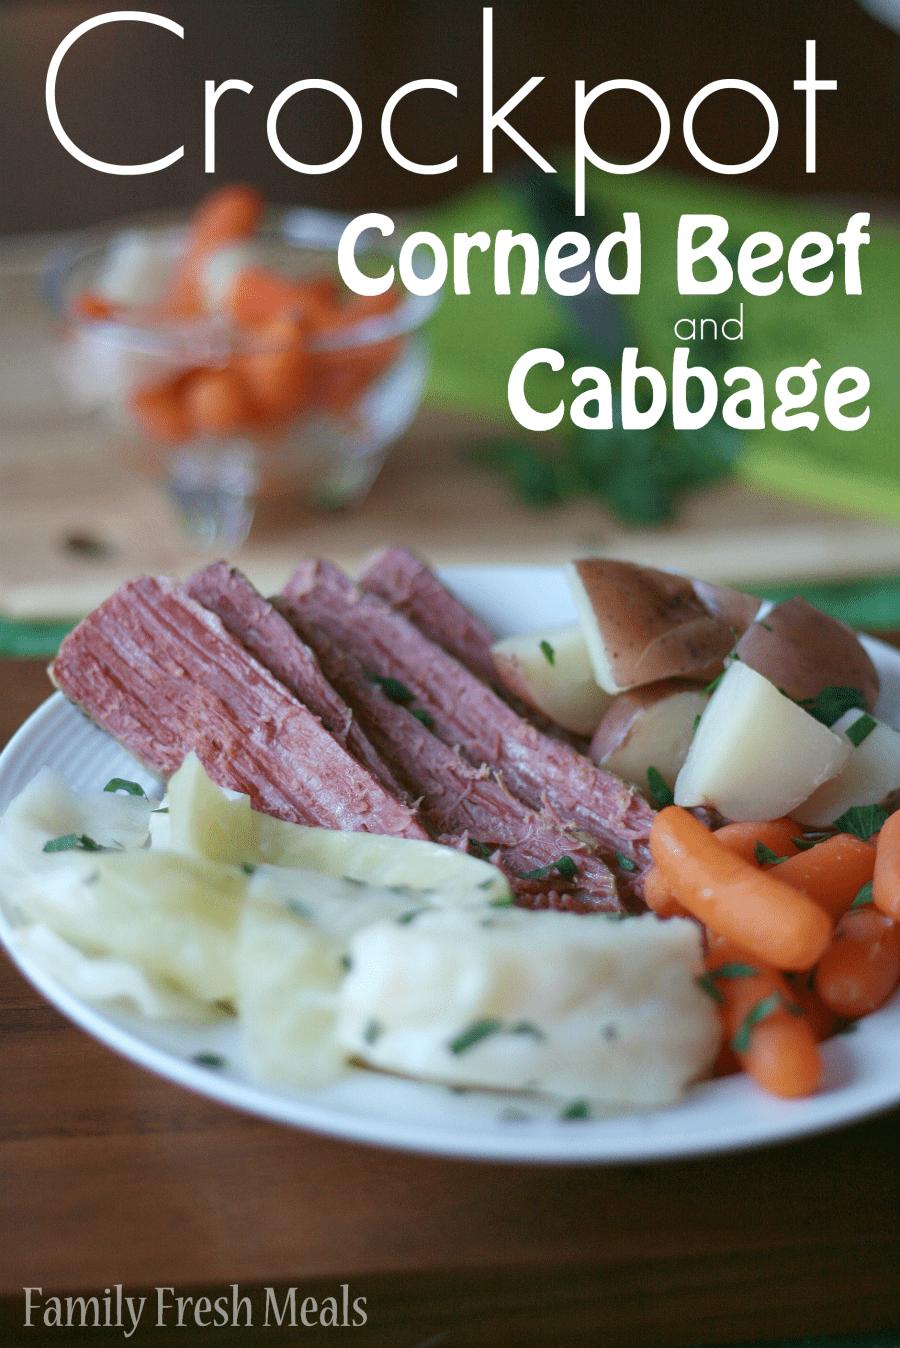 Crockpot Corned Beef and Cabbage via @familyfresh